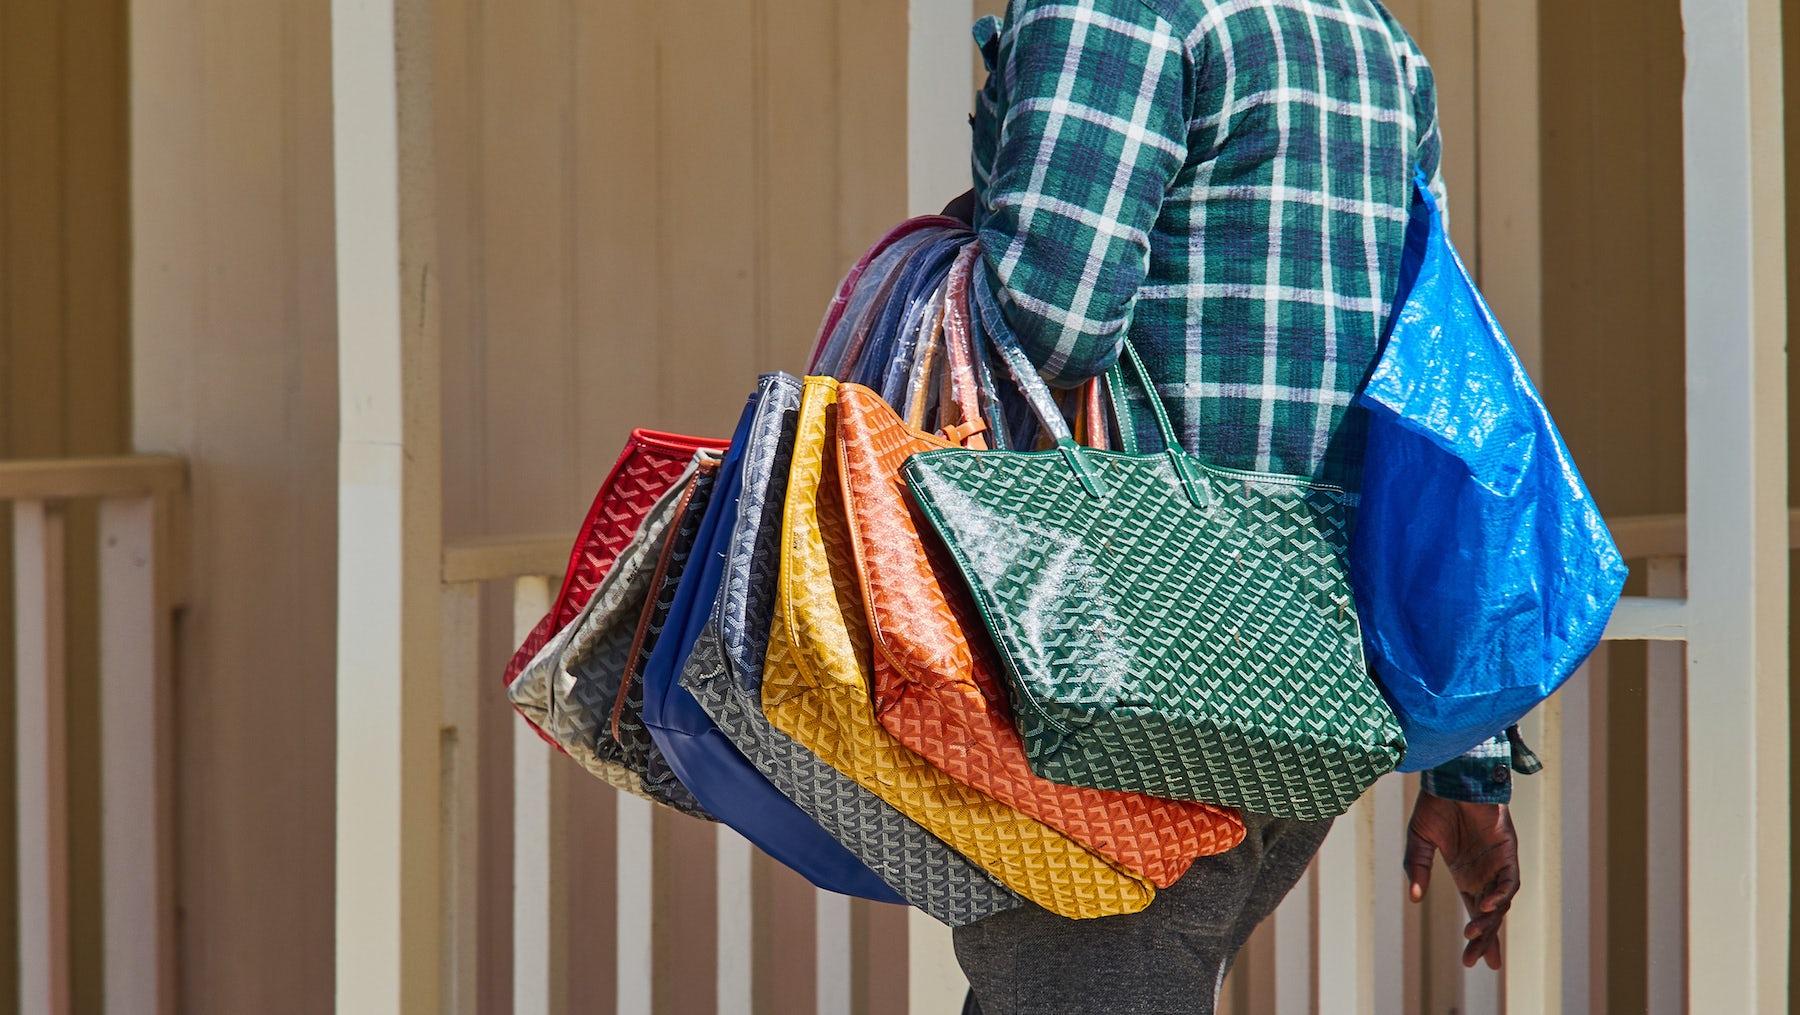 Counterfeit Goyard bags | Source: Shutterstock